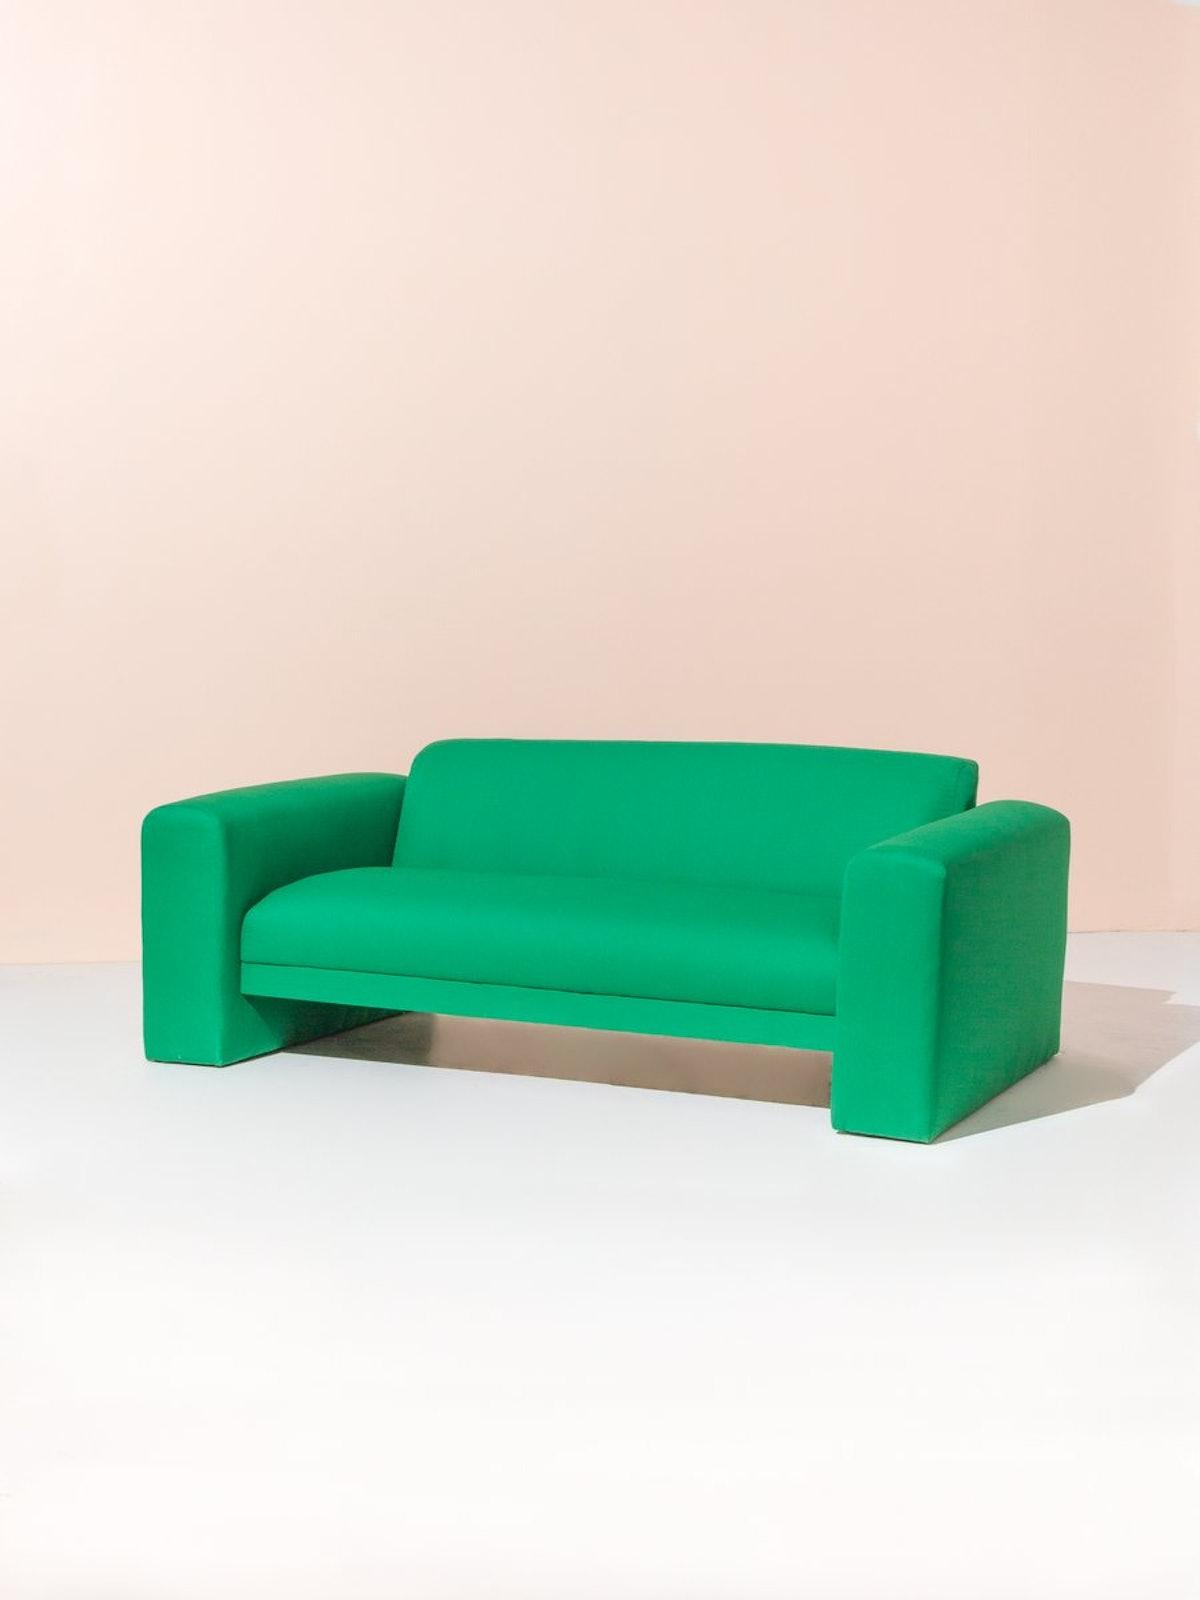 1970s Sofa in Kelly Green